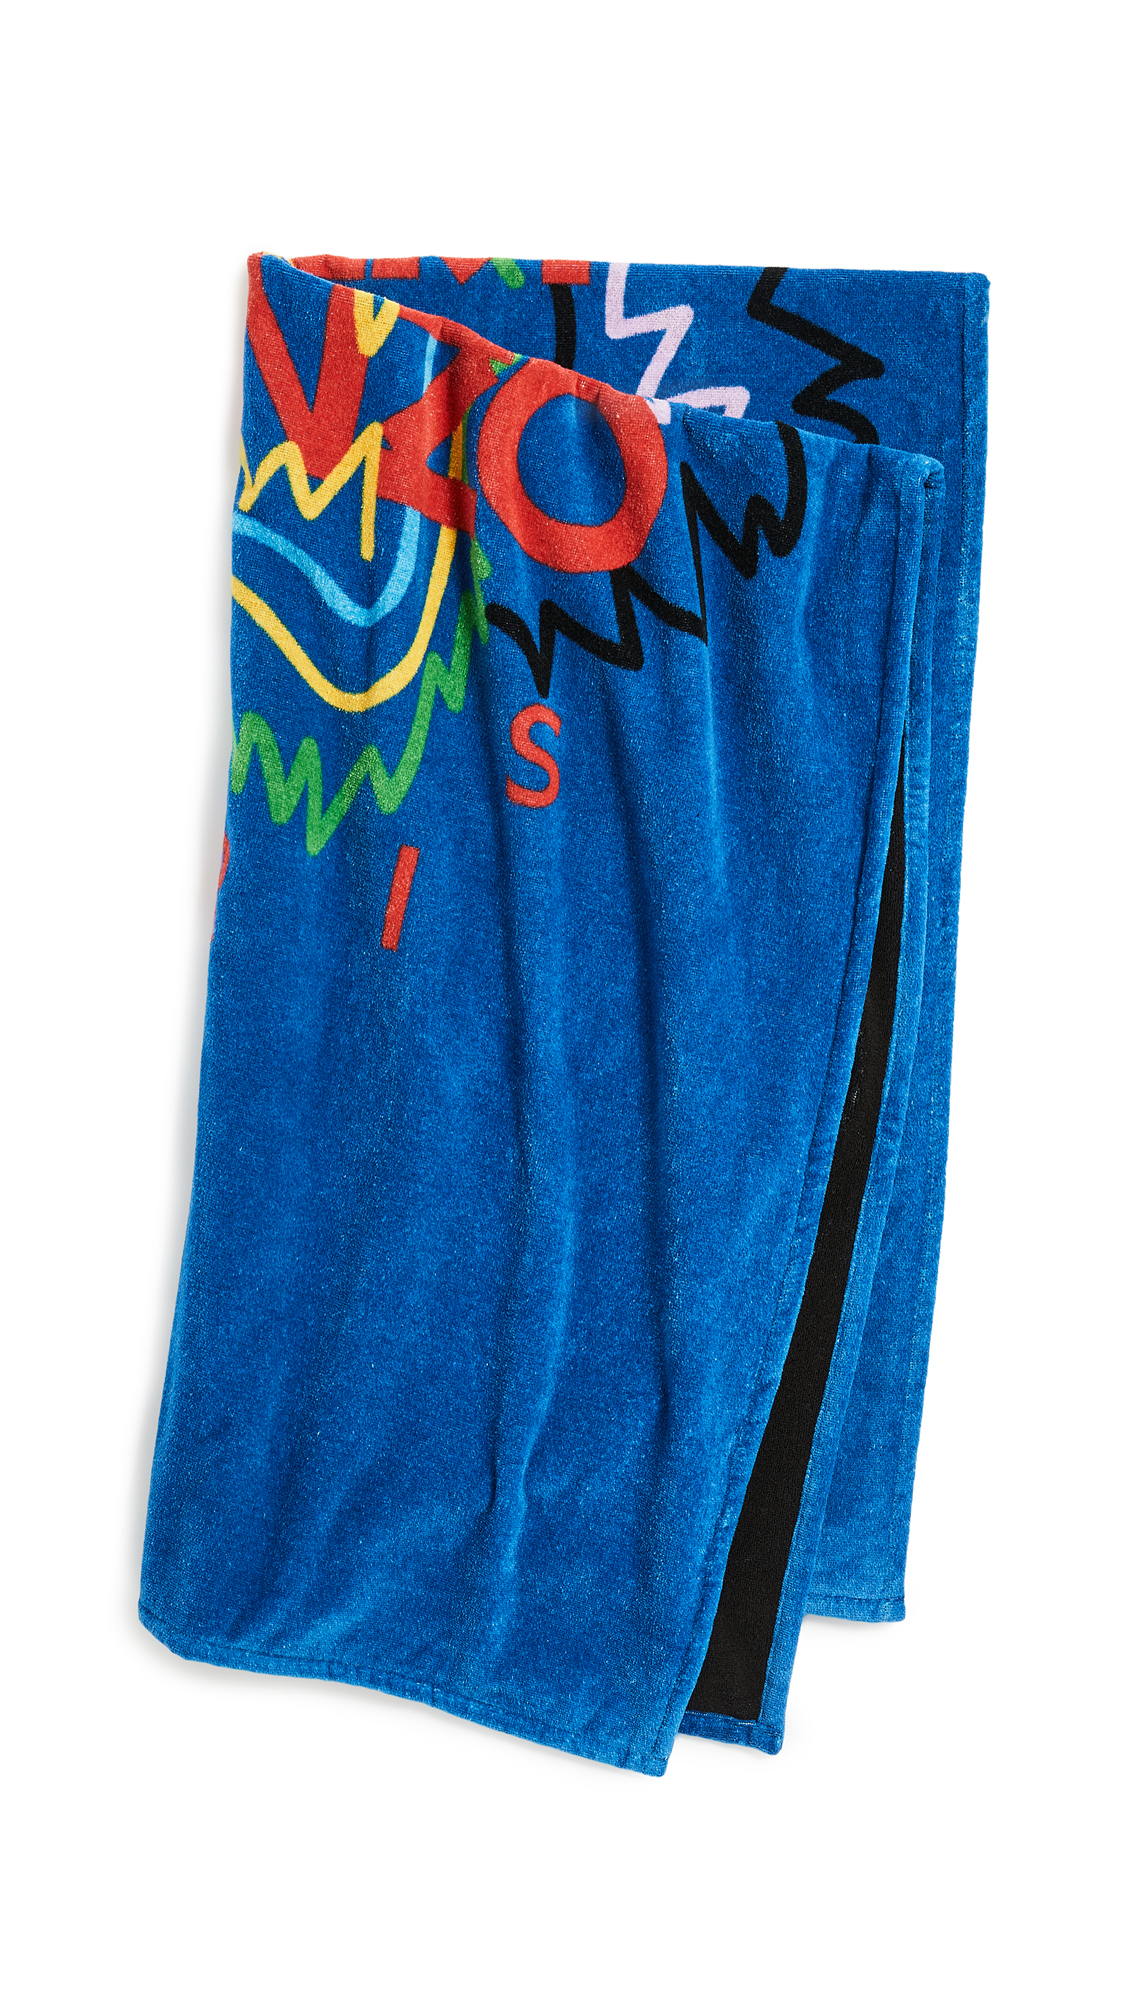 KENZO Tiger Head Beach Towel - Royal Blue